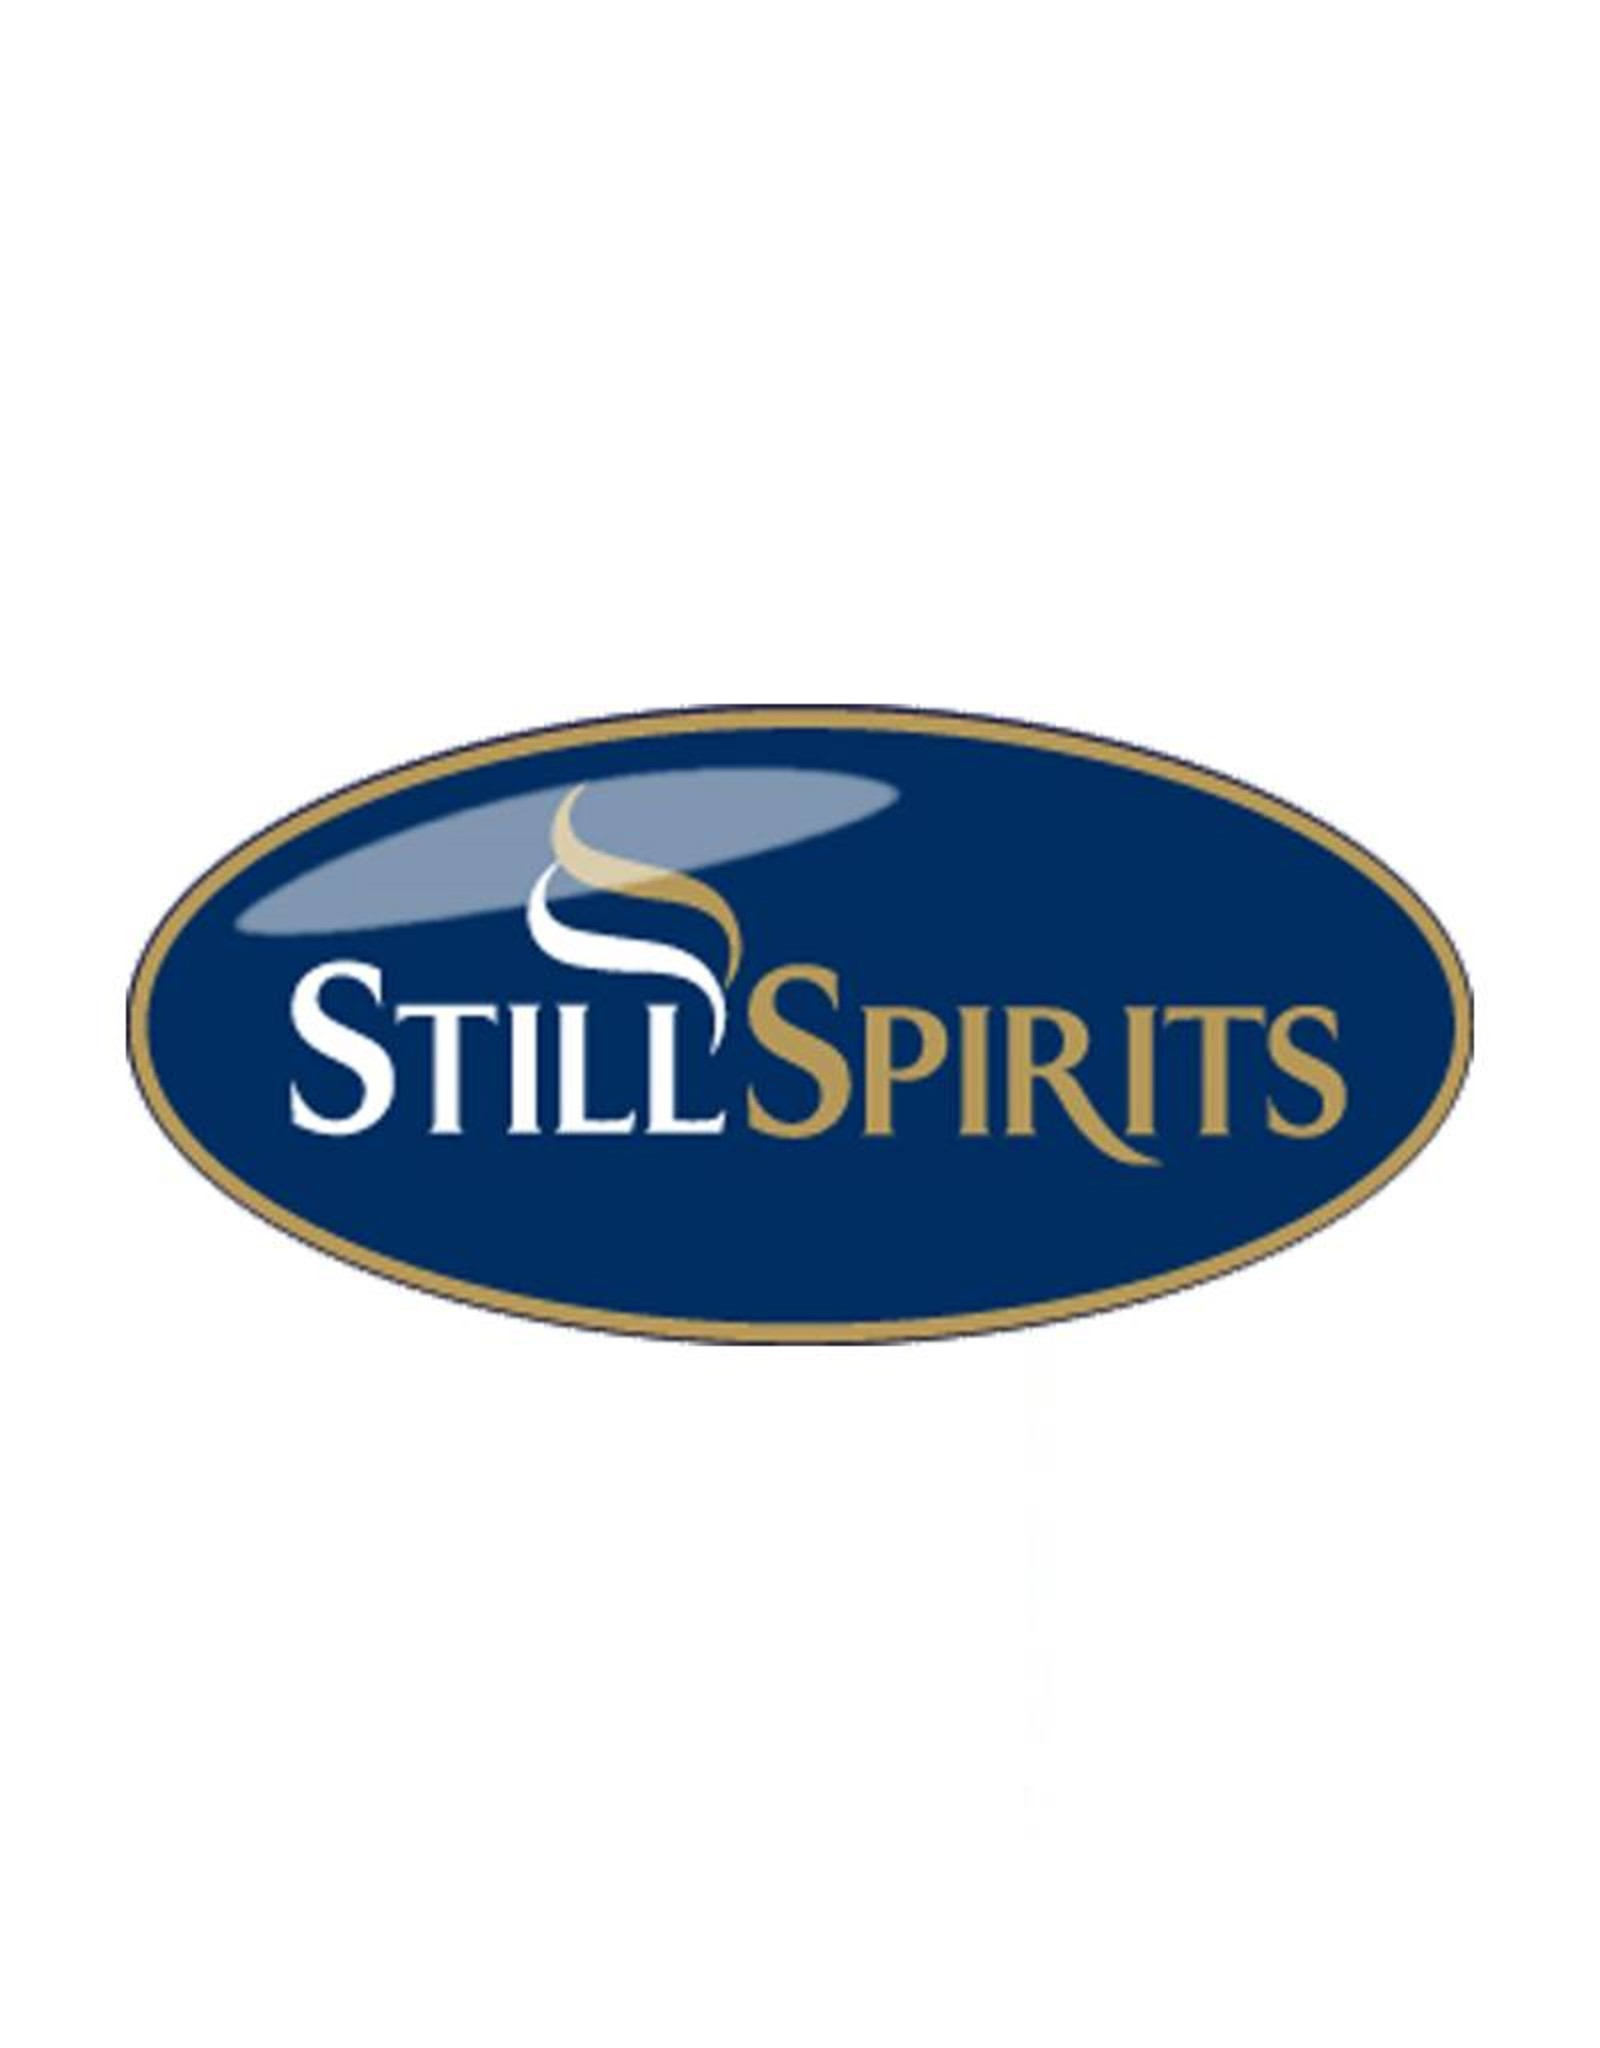 Still Spirits Turbo Yeast Fast (24 hour)